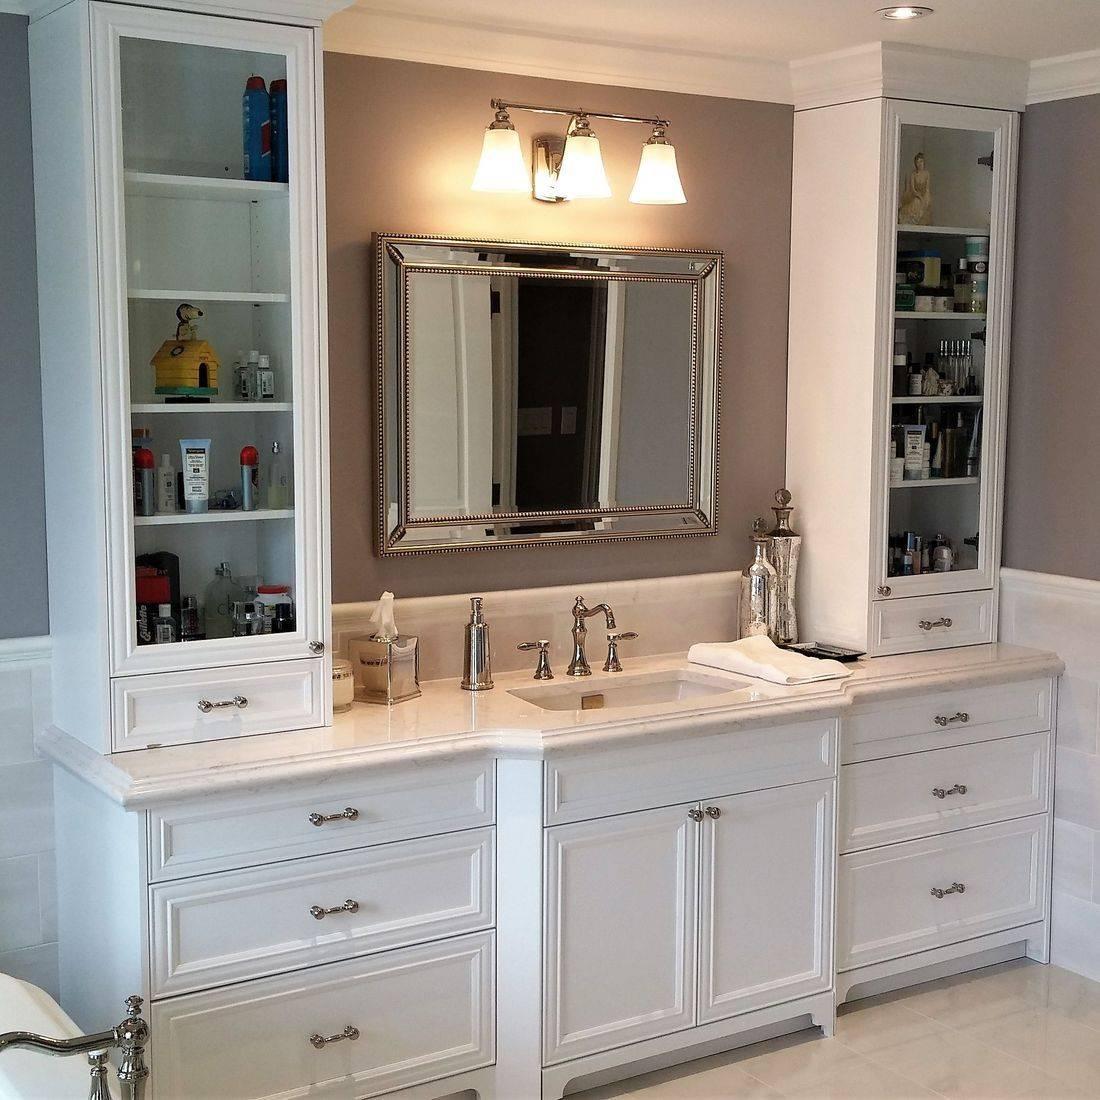 Sibra Kitchens Markham Toronto cabinets bathroom vanity cambria quartz